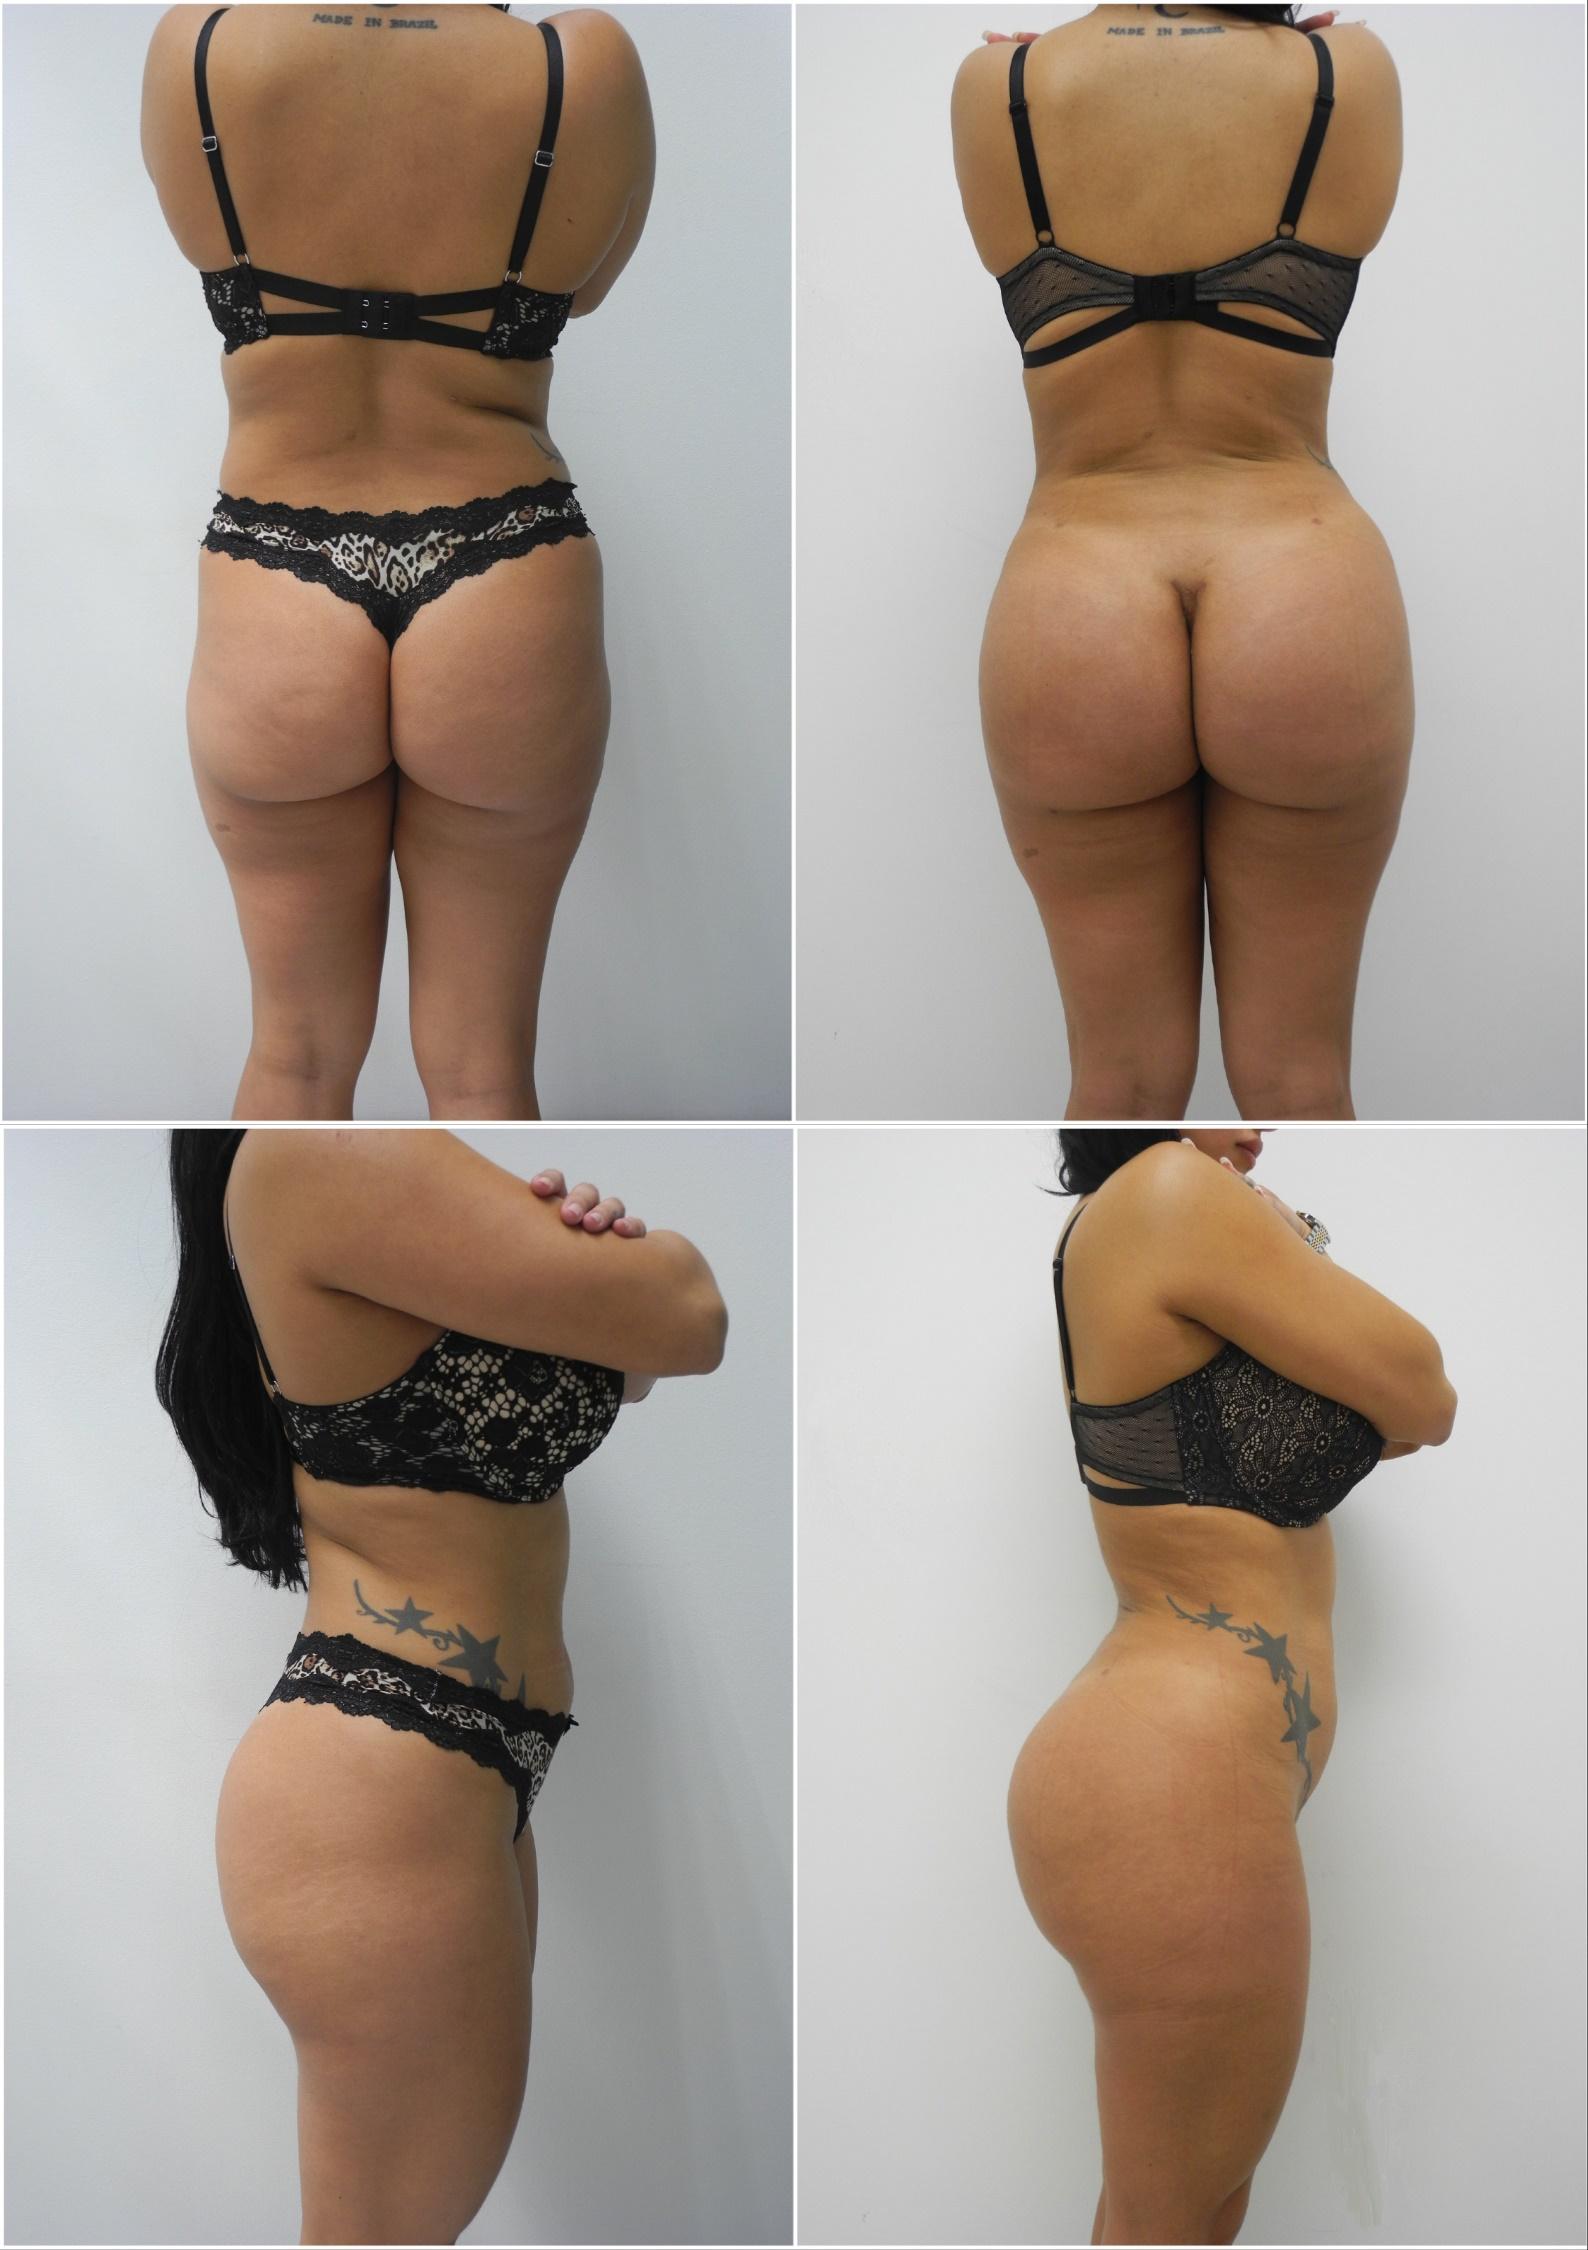 Butt implants price